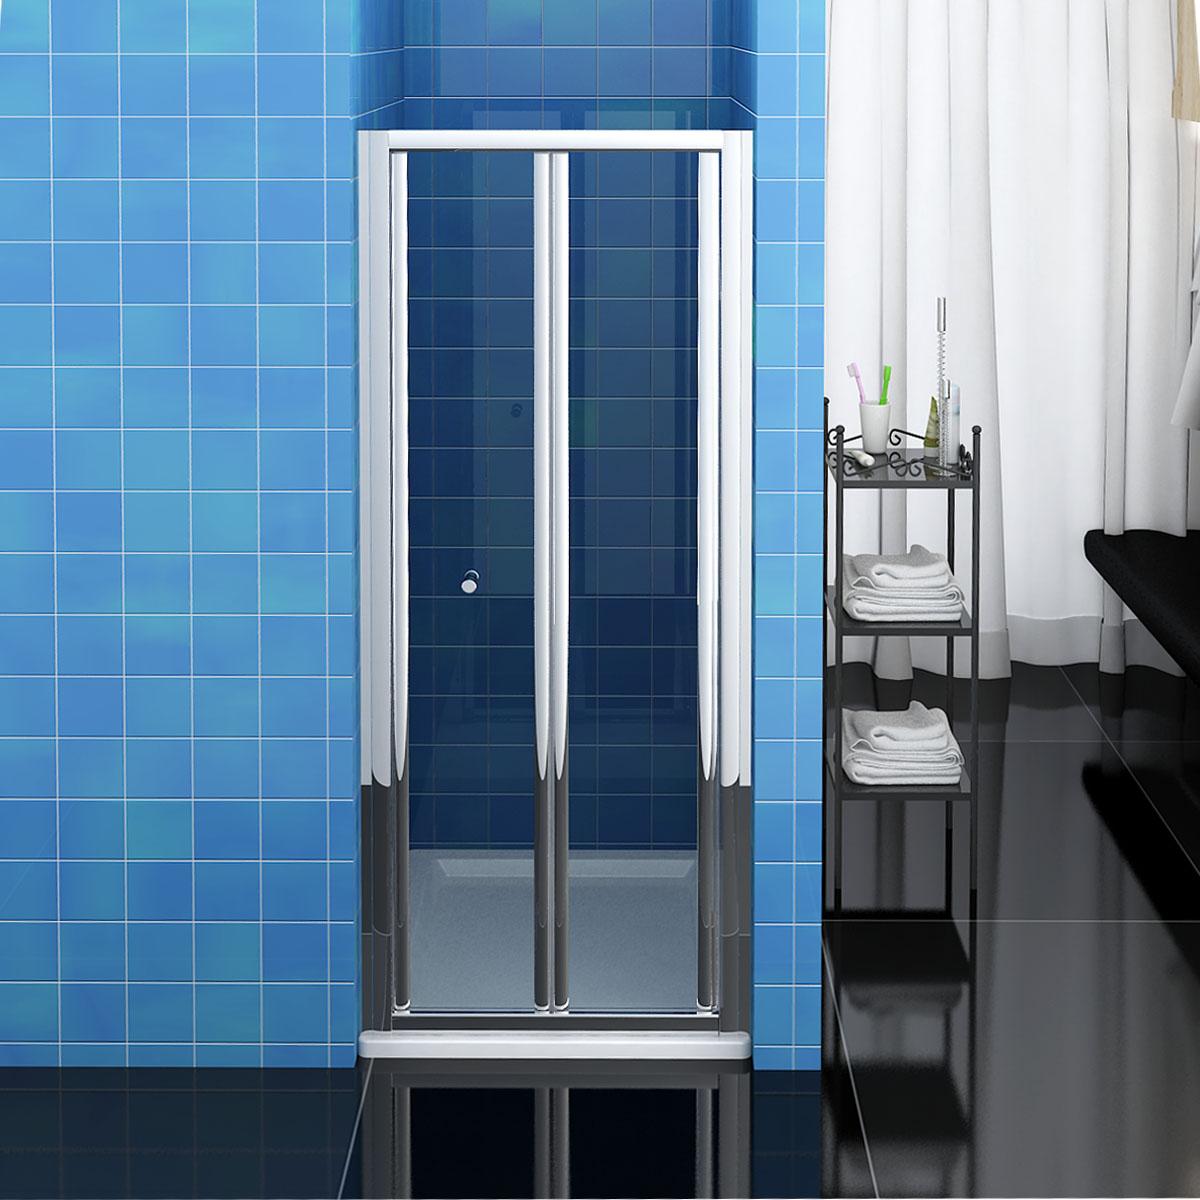 Bathroom Bi Fold Shower Door 900mm Enclosure Cubicle Glass